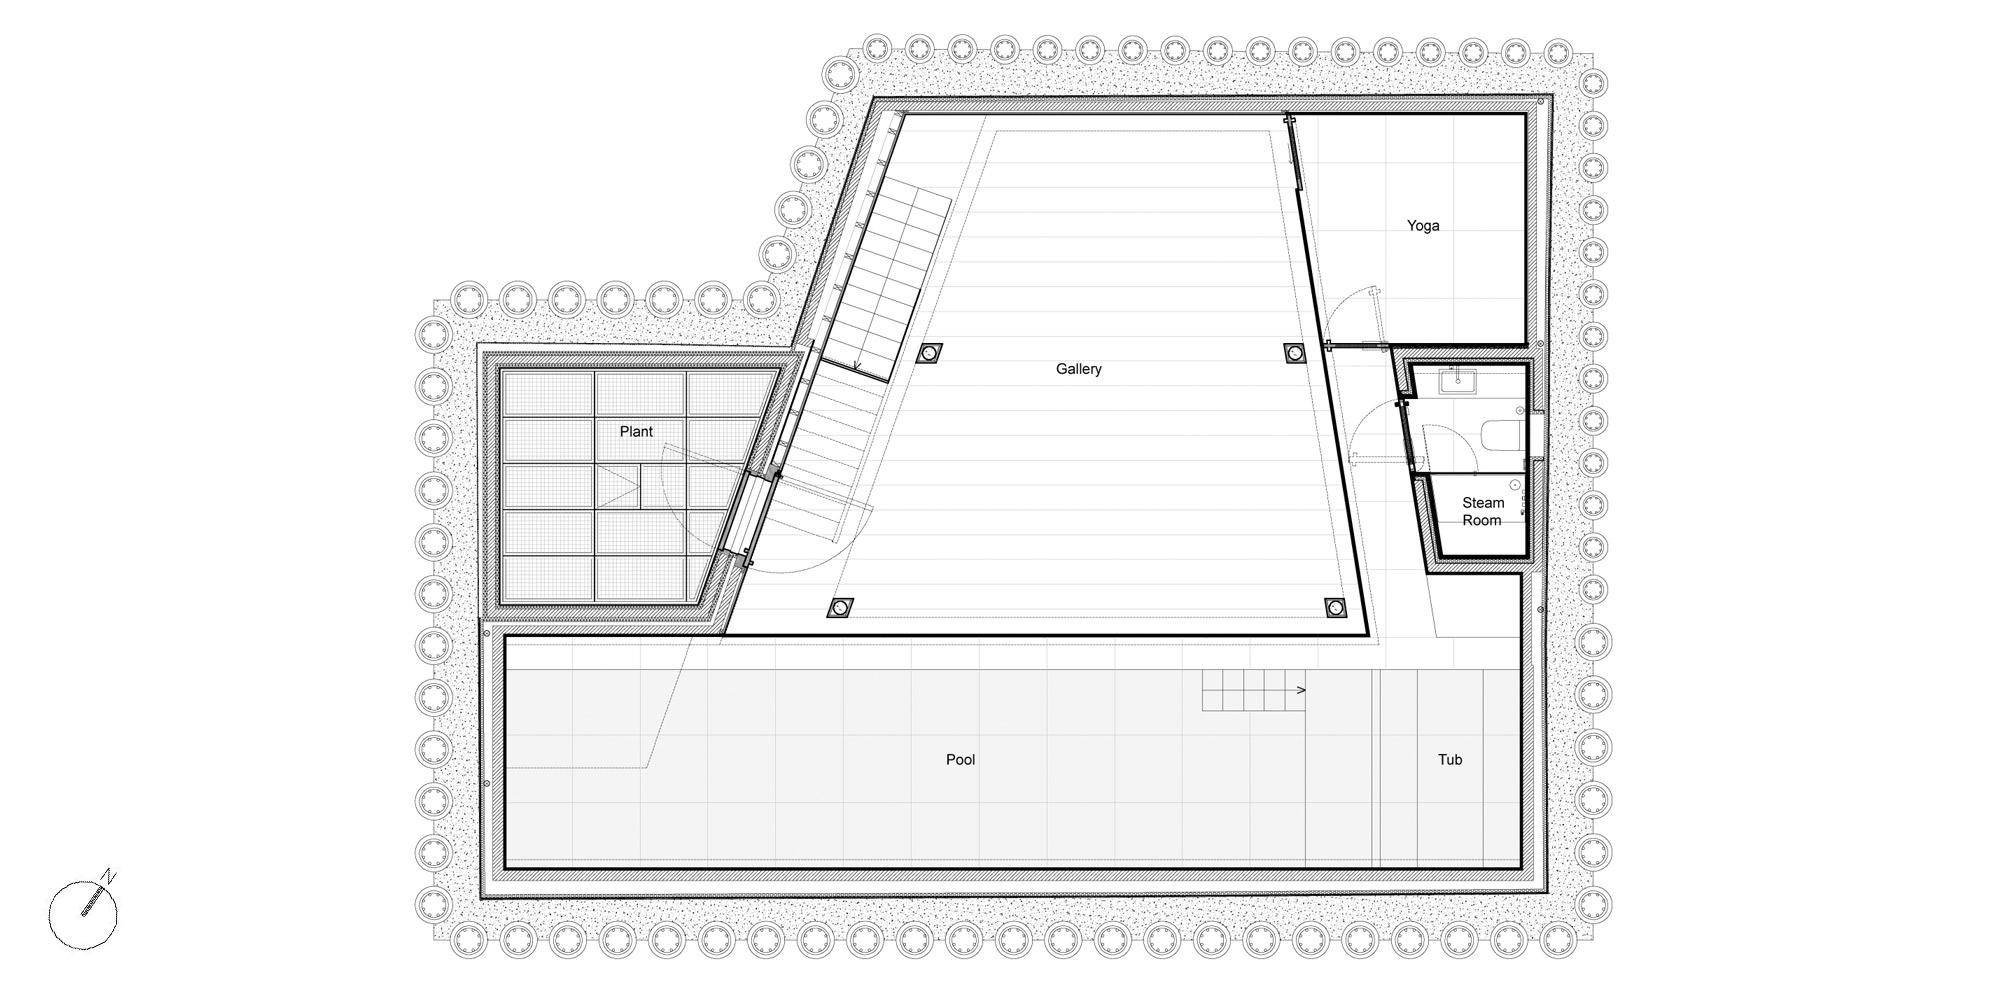 Gianni Botsford Architects |